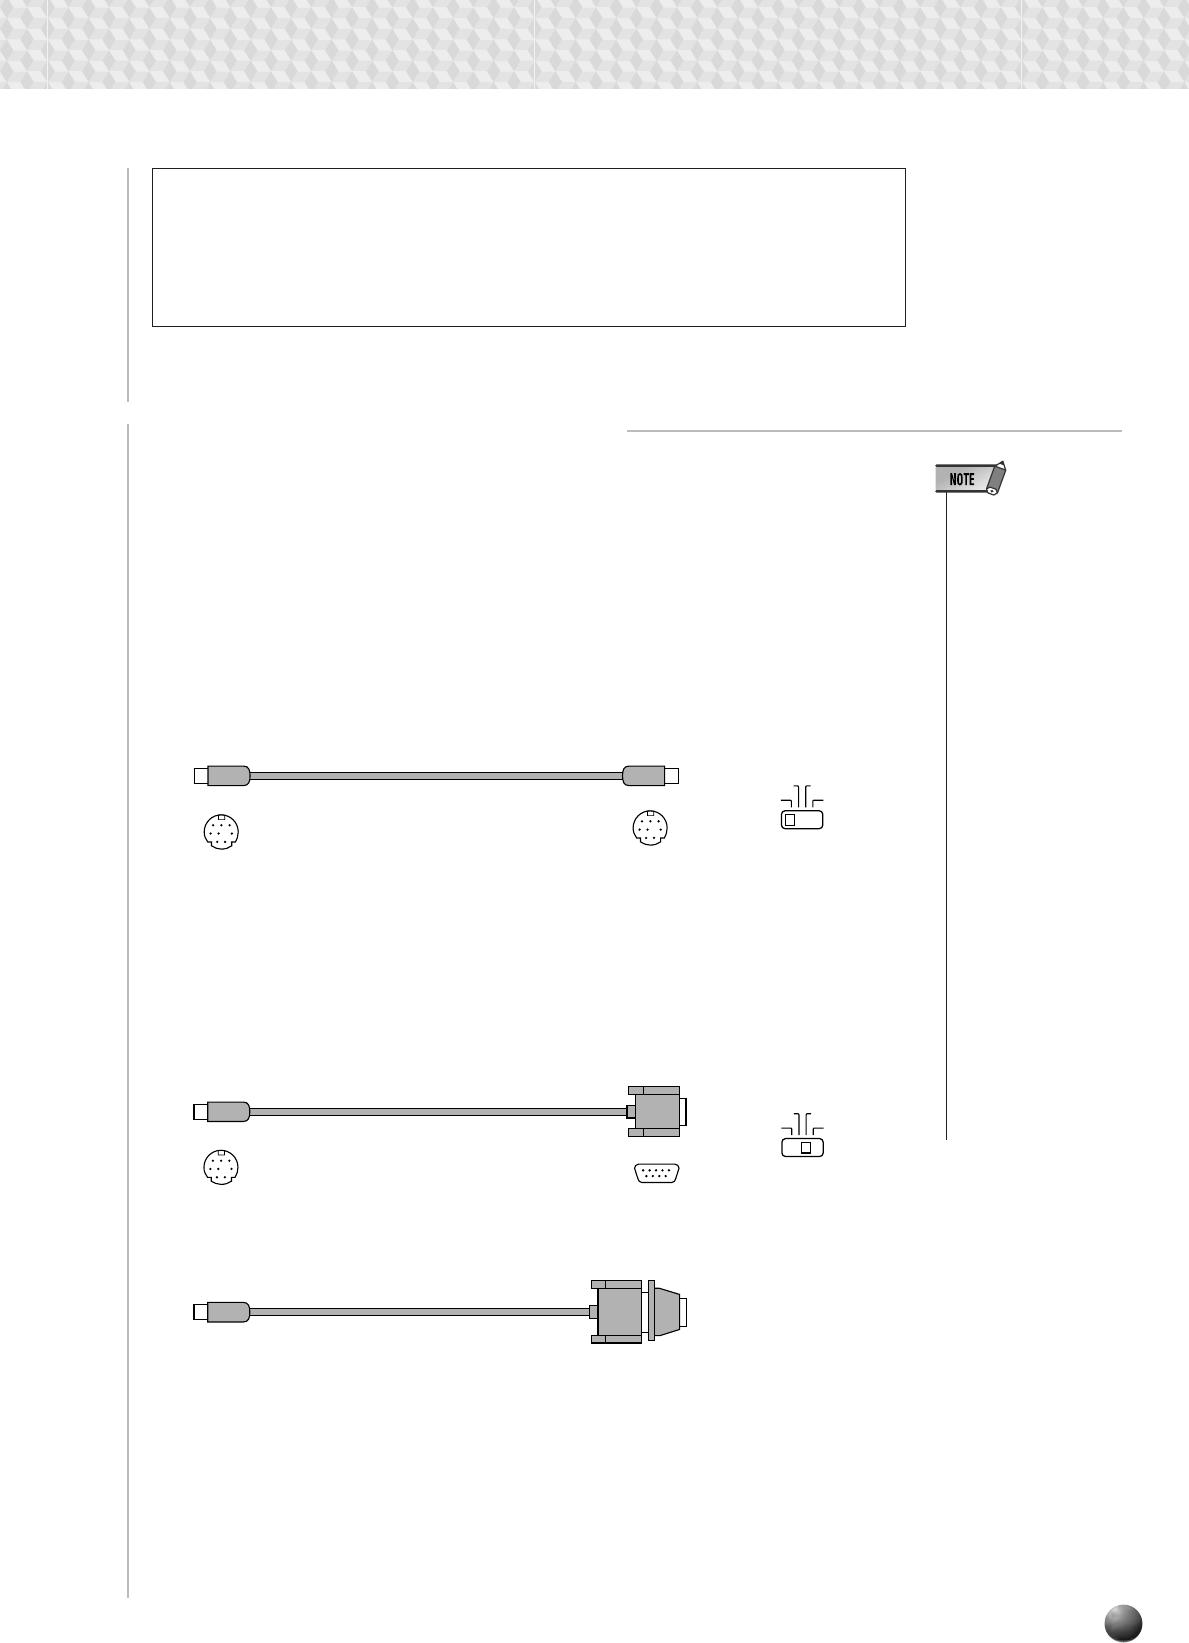 Yamaha Psr 530 Owners Manual Fc5 Pedal Wiring Diagram 91